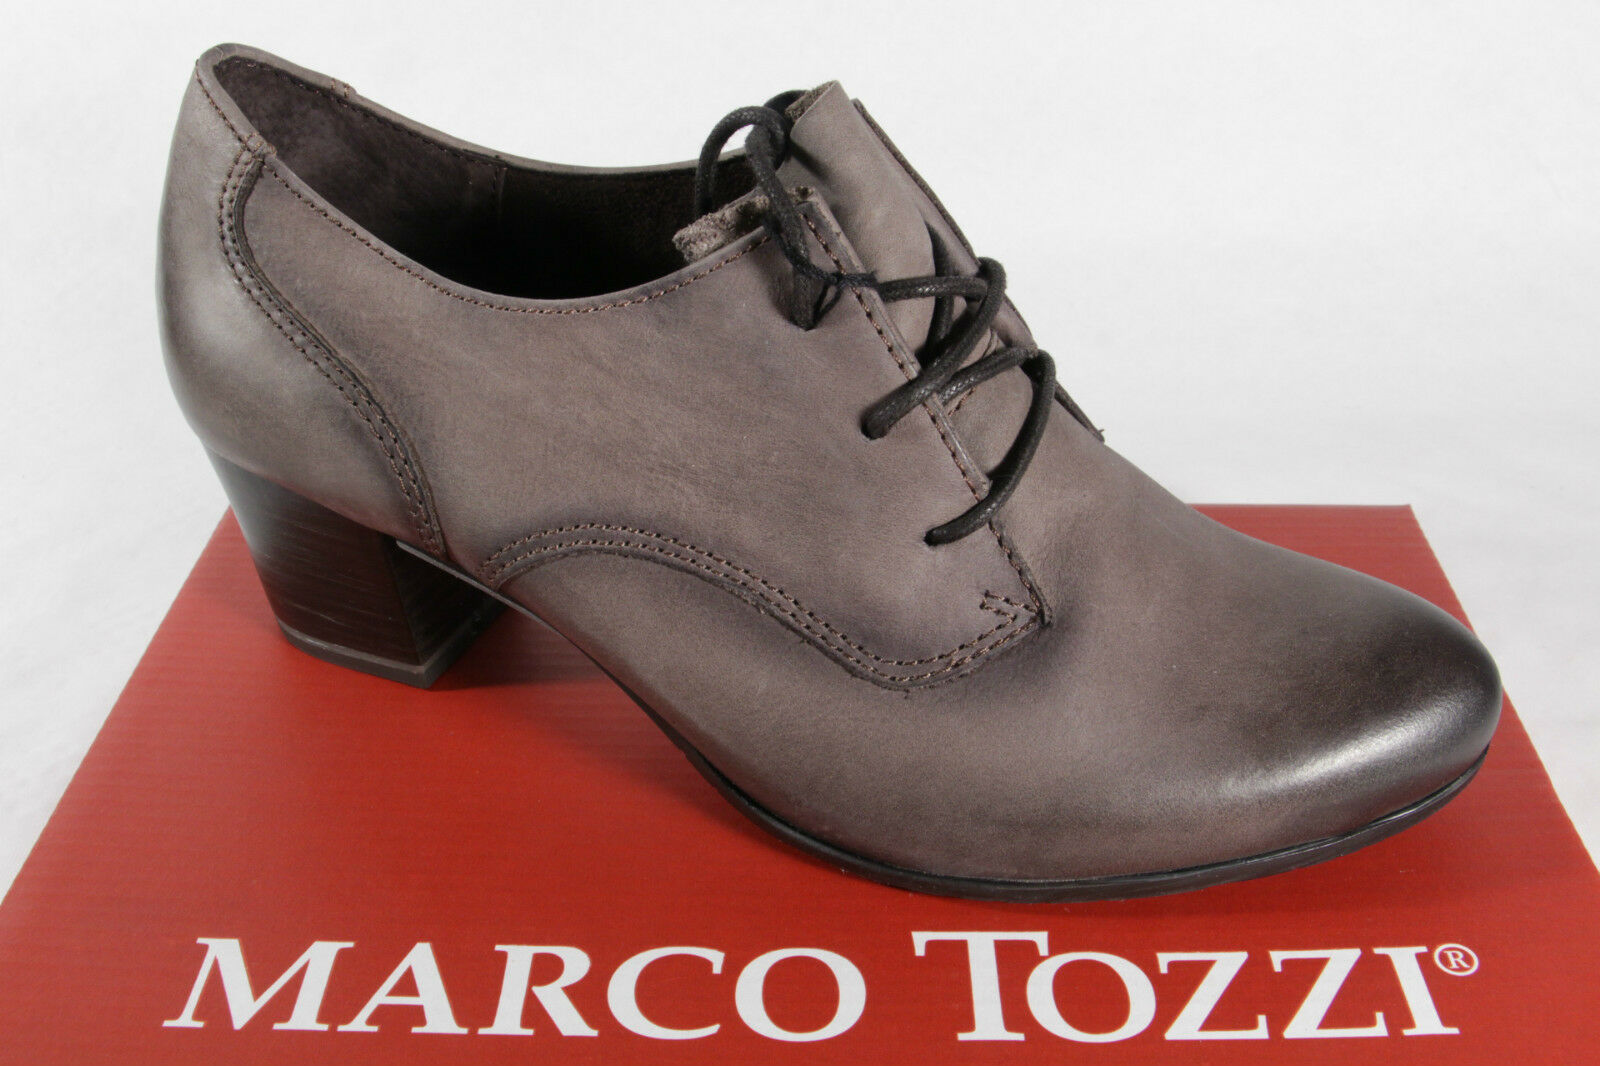 Marco Tozzi de zapatos  de Tozzi Cordones, Mocasines, Mocasínes, Gris, Cuero Aut. Nuevo 2583c6